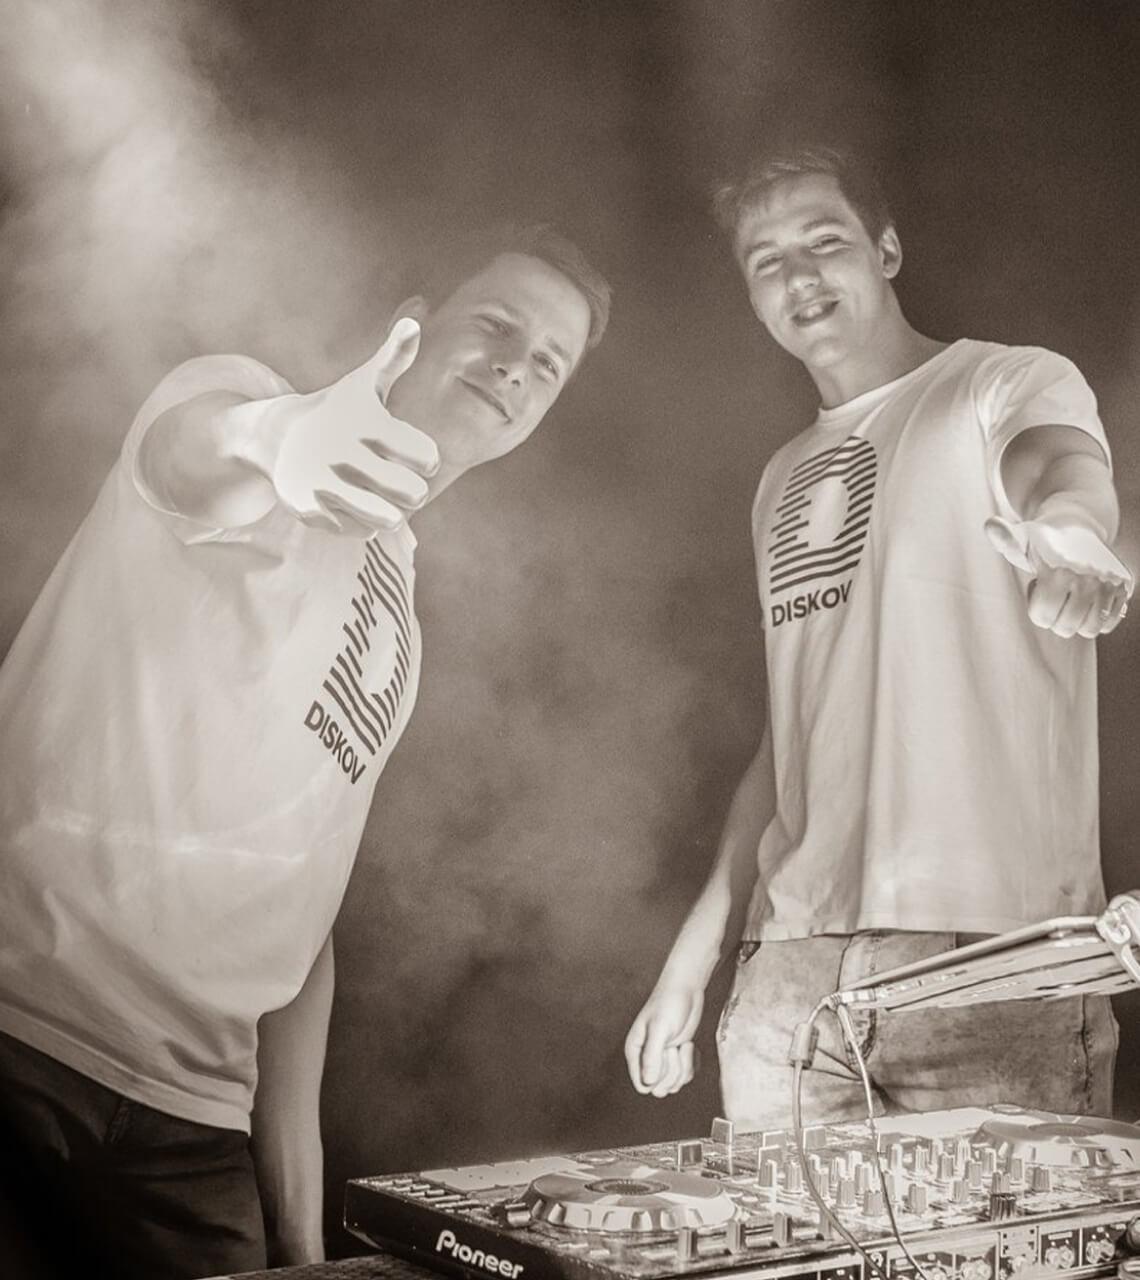 Diskov DJs